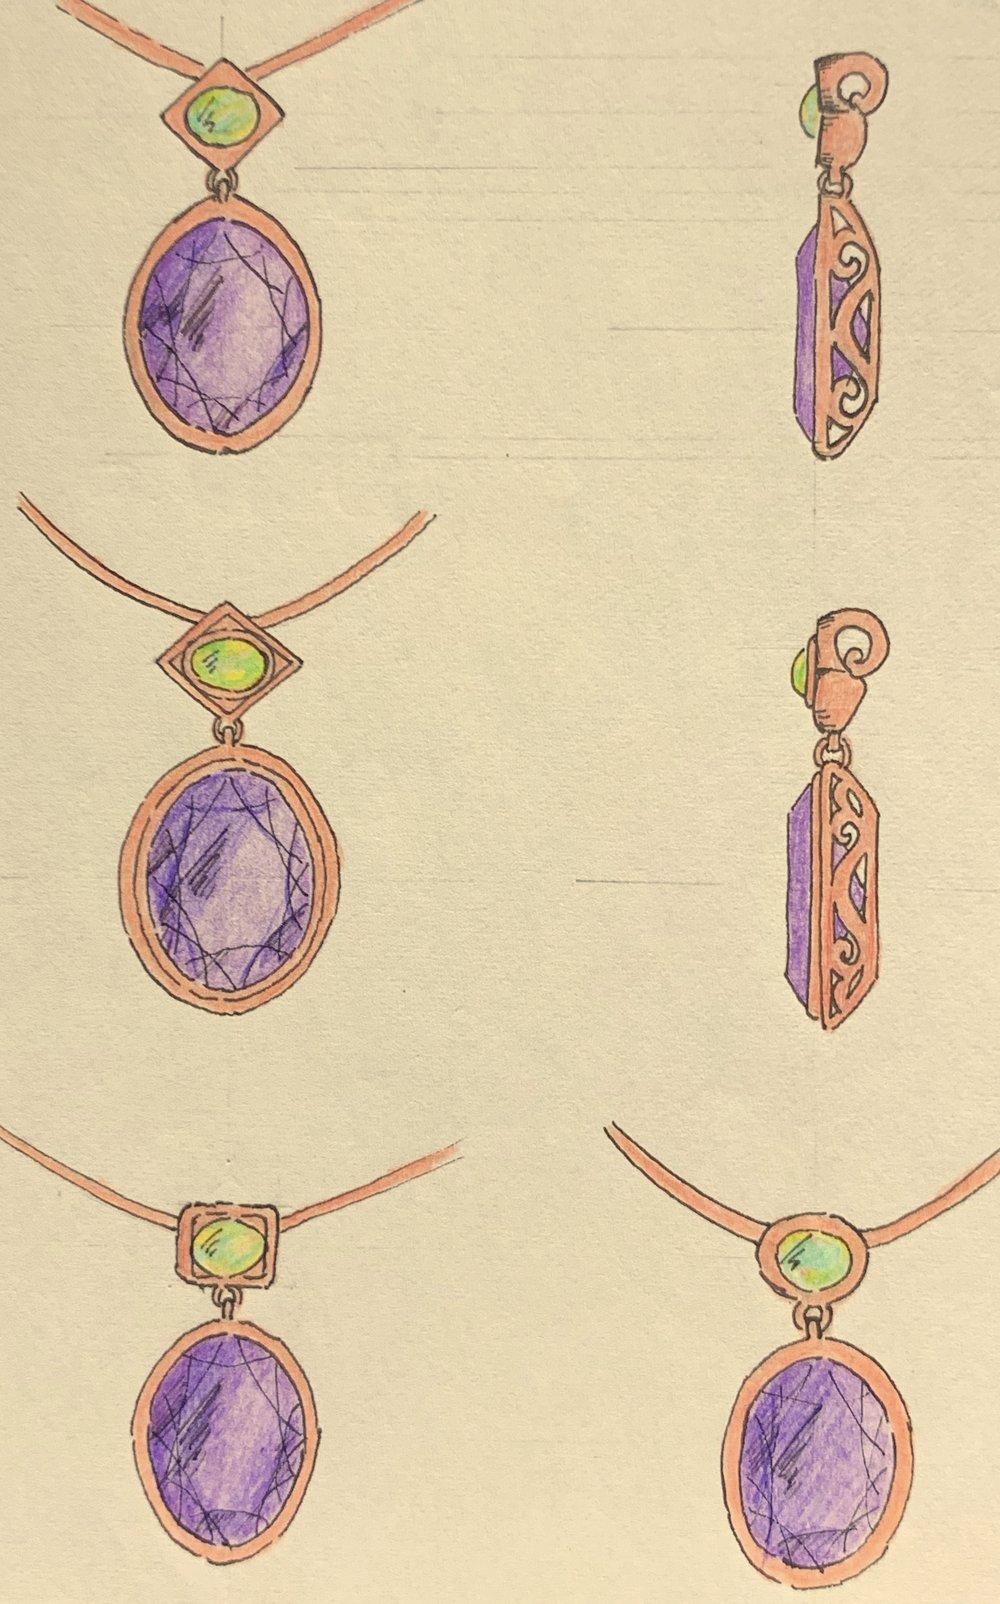 Rose gold, peridot and amethyst pendant variations.